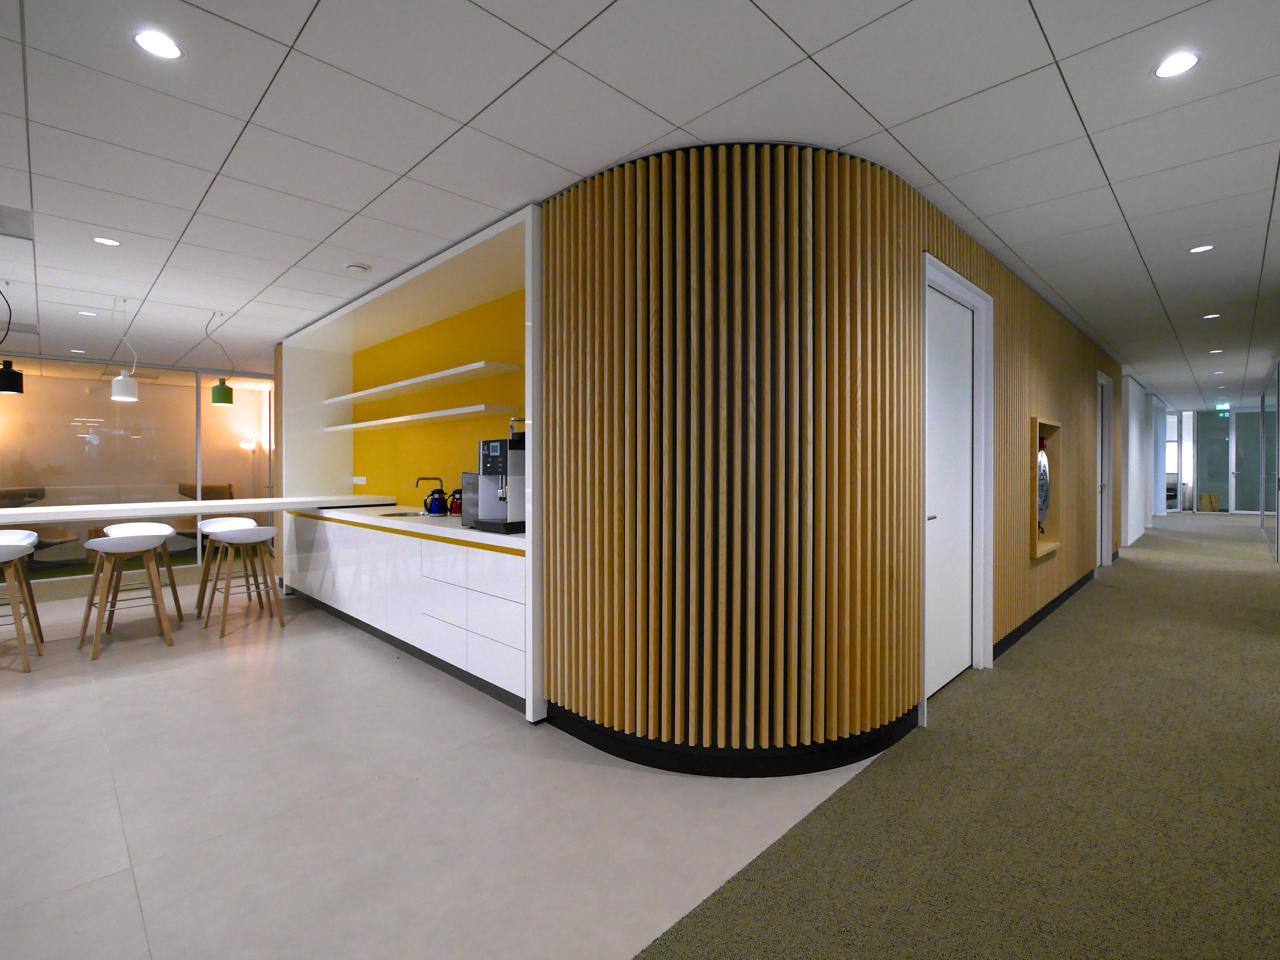 H kwadraat architectuur b v herman thijs interieurbouw for Interieur hermans